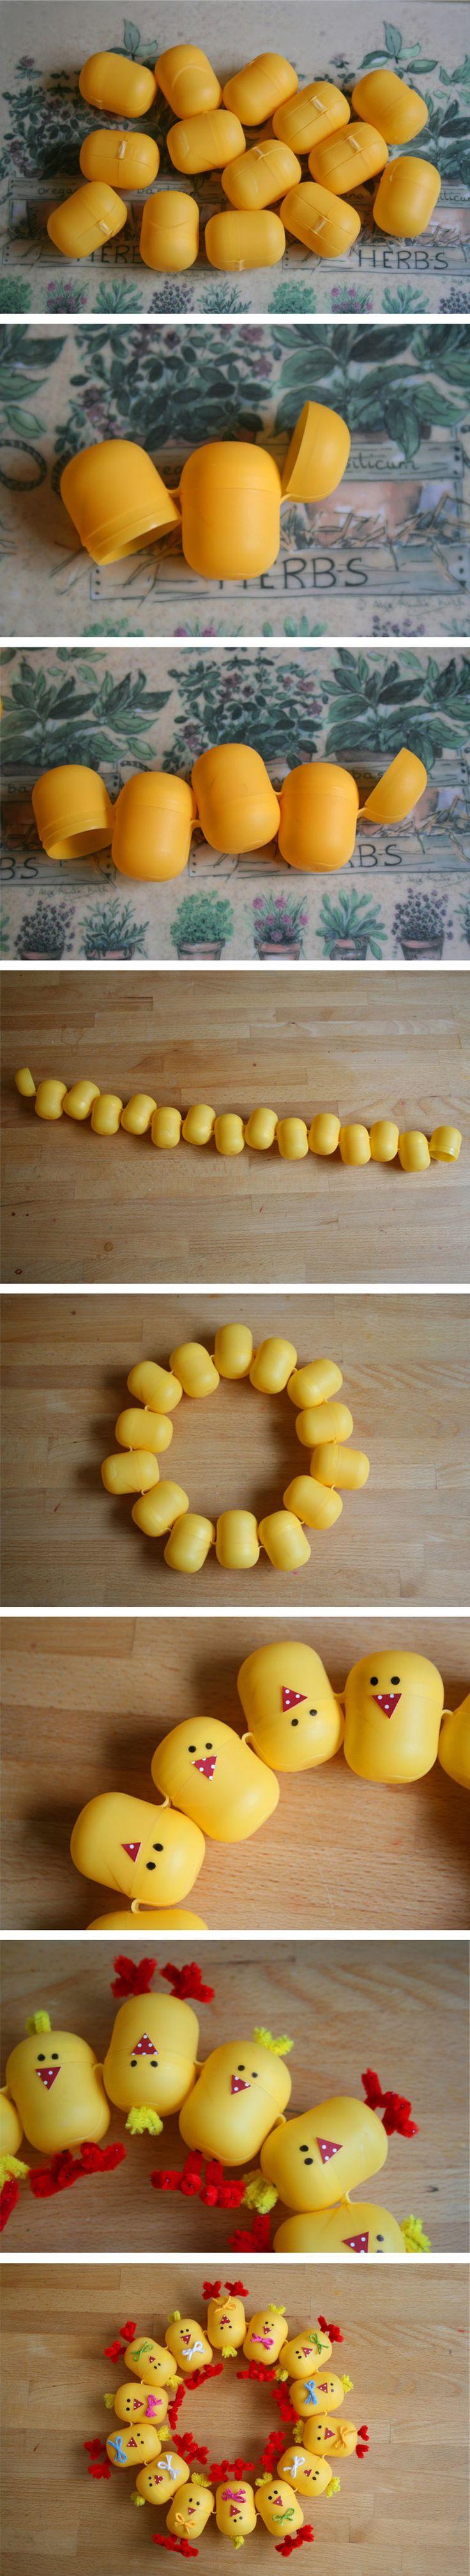 Corona decorativa con huevos Kinder